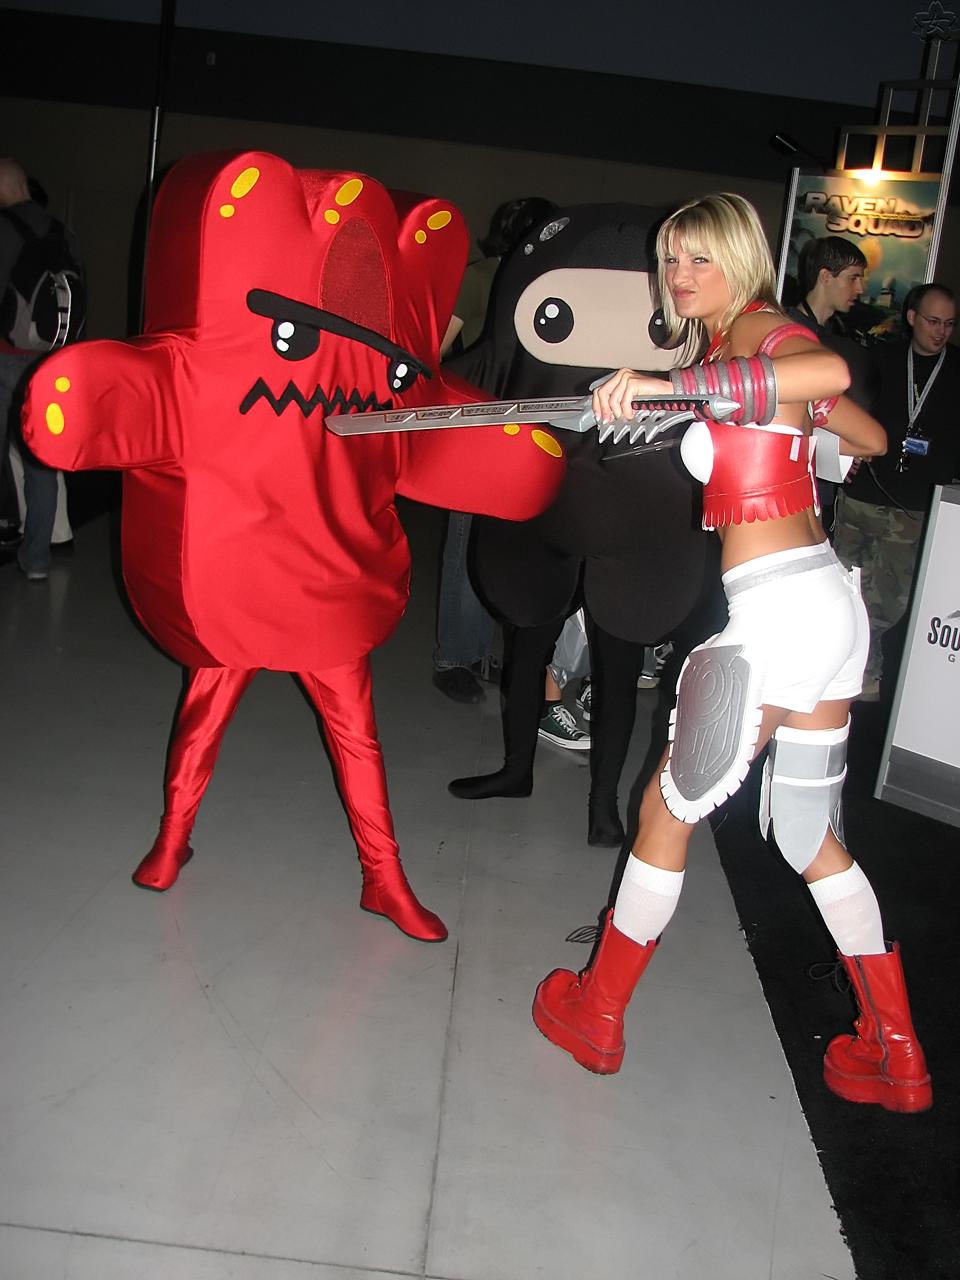 X Blades Ayumi Cosplay Ayumi vs. Ninjas - a p...